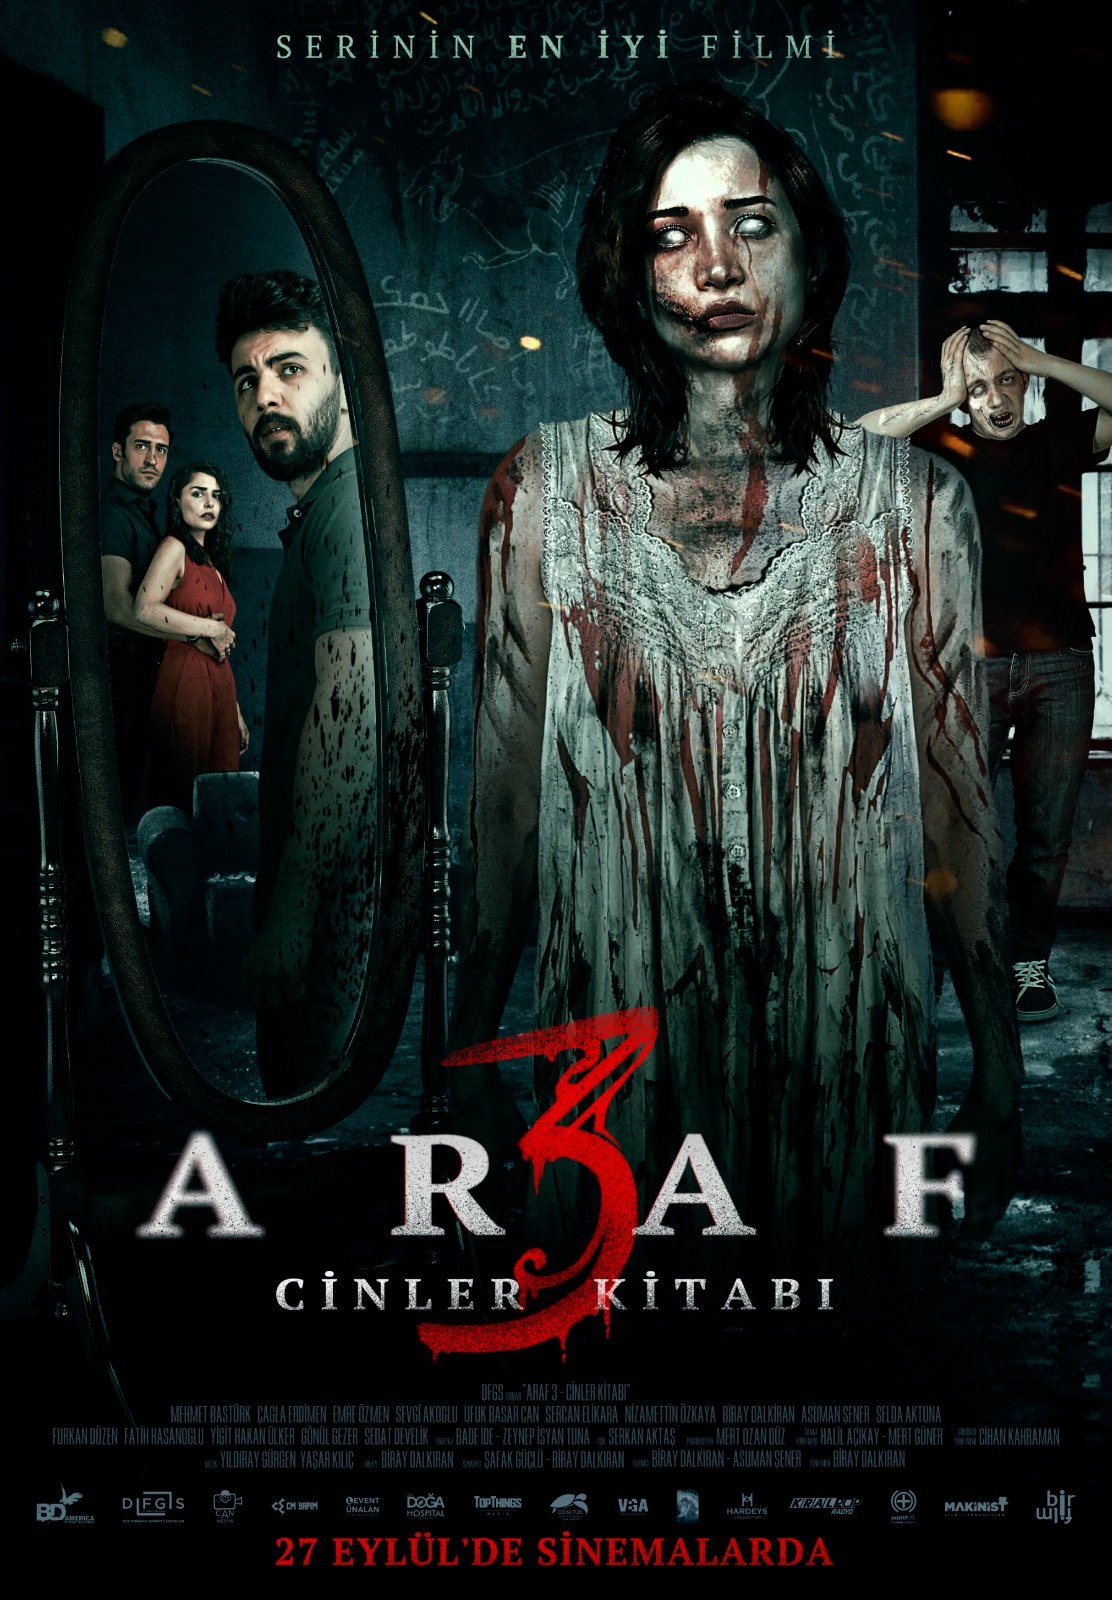 Araf 3 – Cinler Kitabi (2019) ORG Hindi Dual Audio 480p BluRay x264 ESubs 330MB